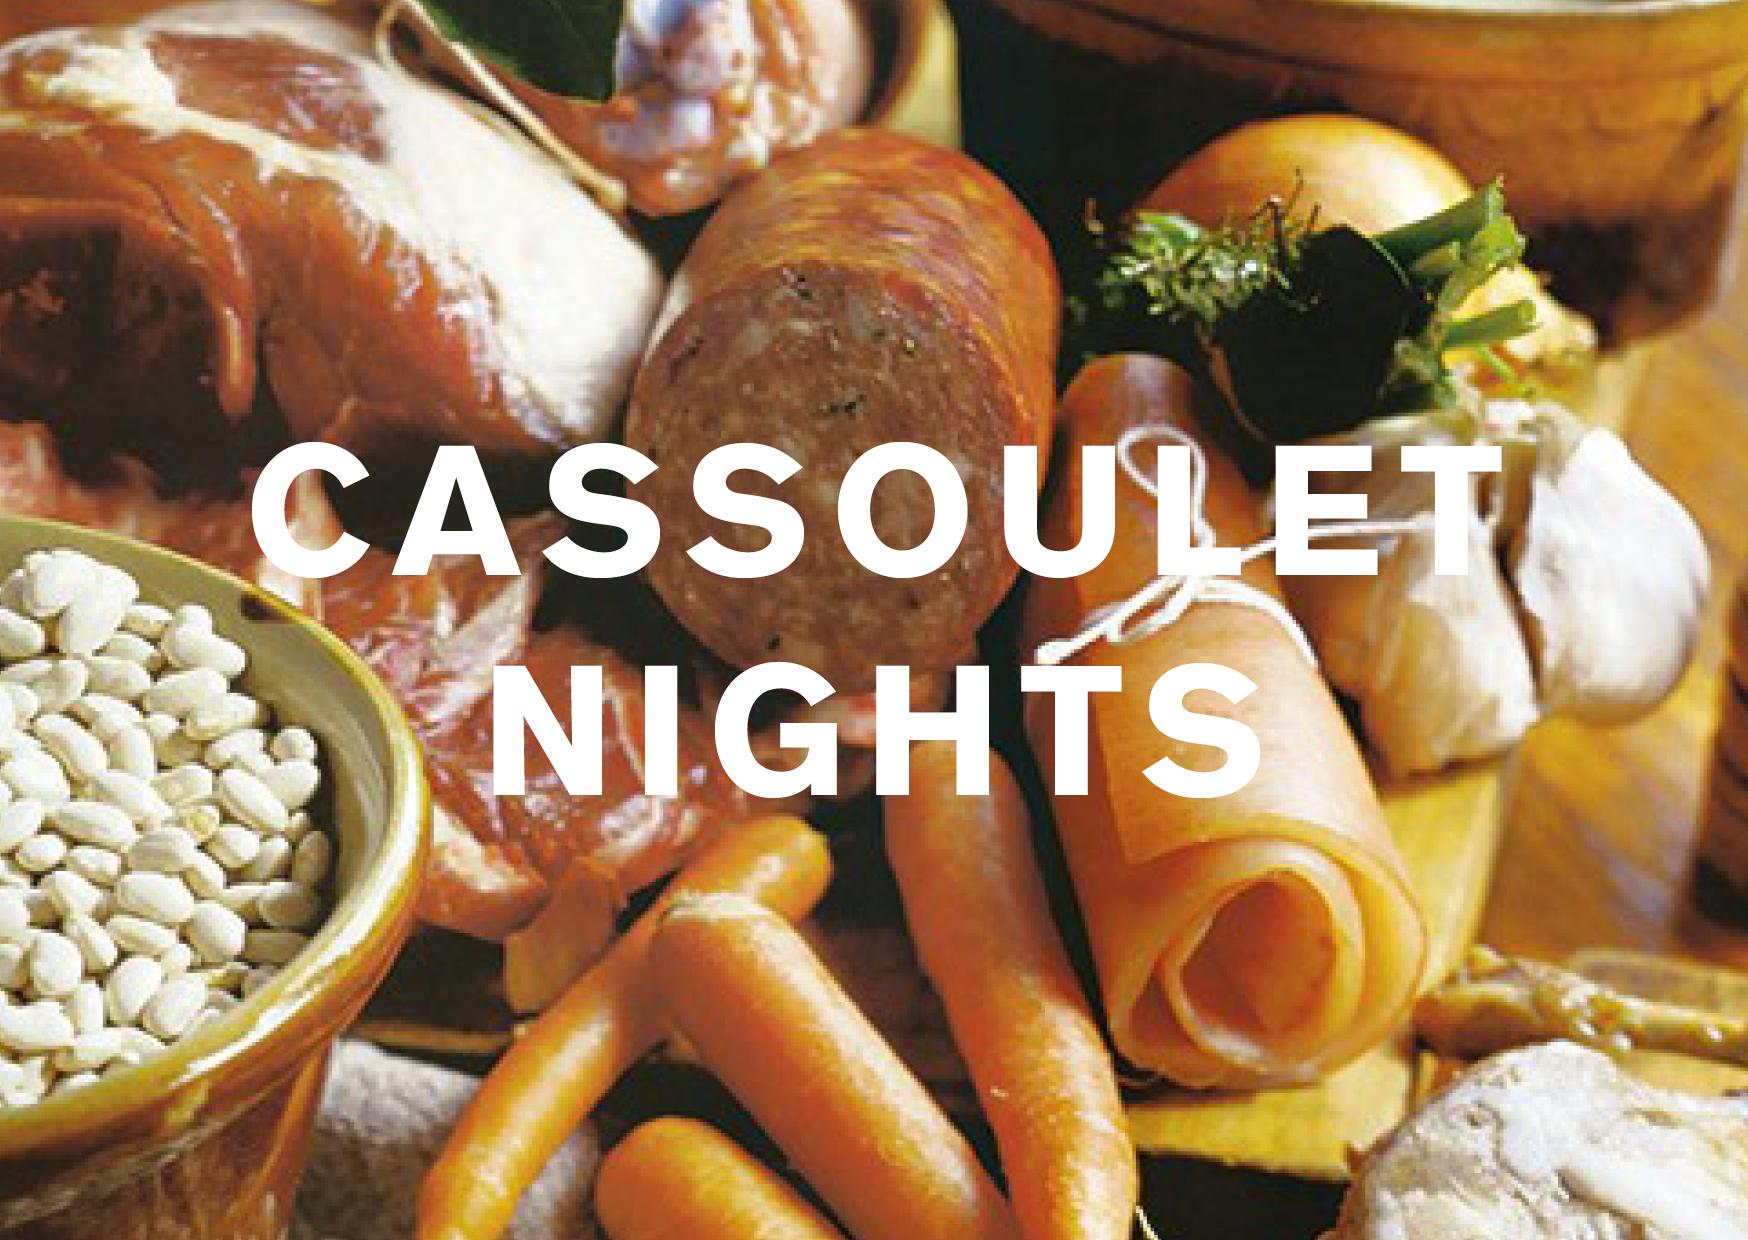 cassoulet nights for web.jpg